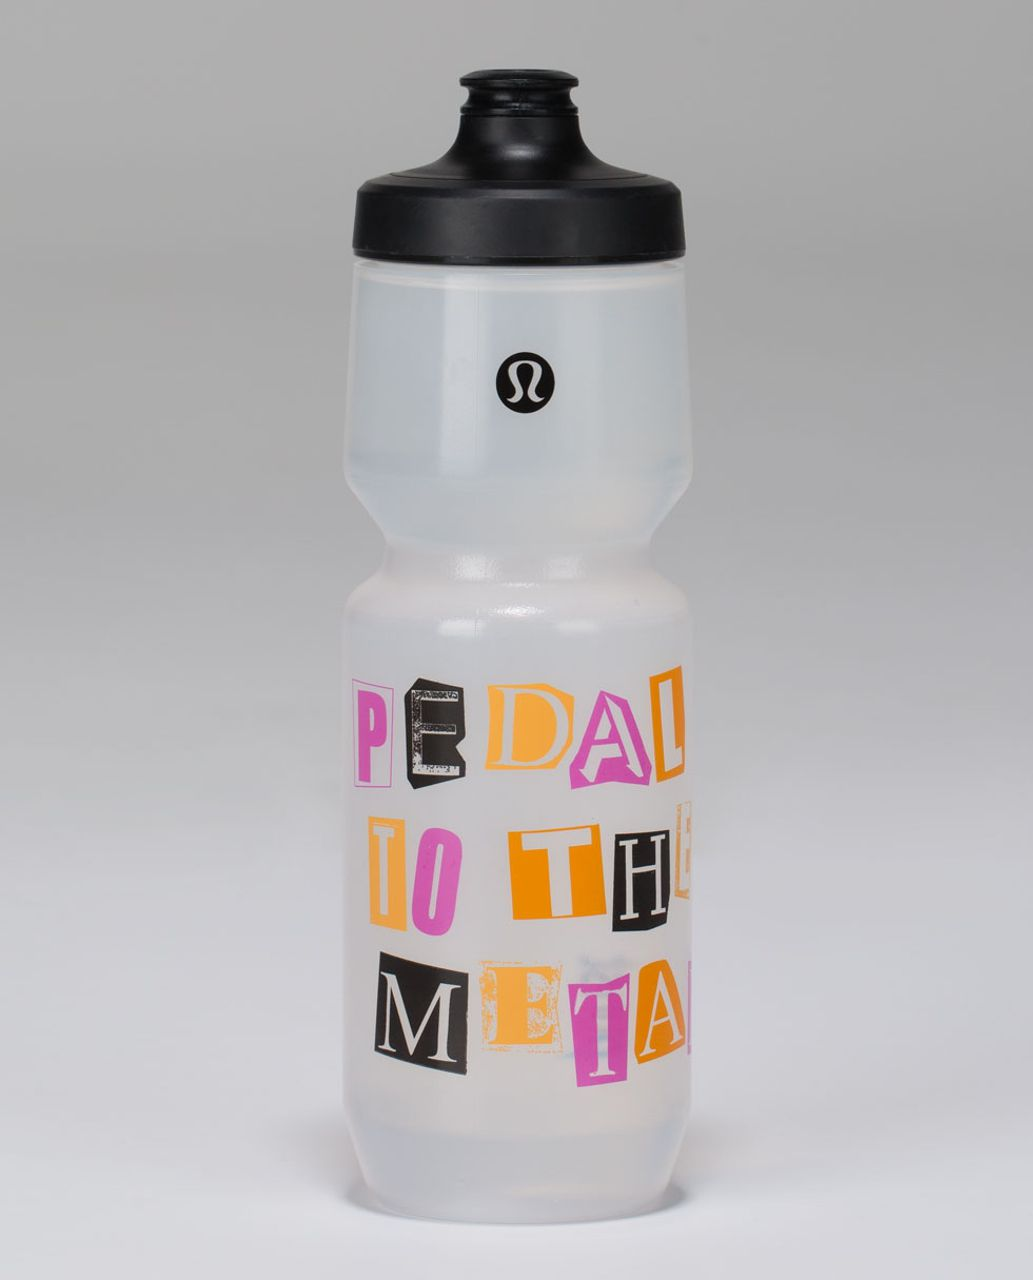 Lululemon Purist Cycling Water Bottle II - Petal To The Metal Pow Pink Light